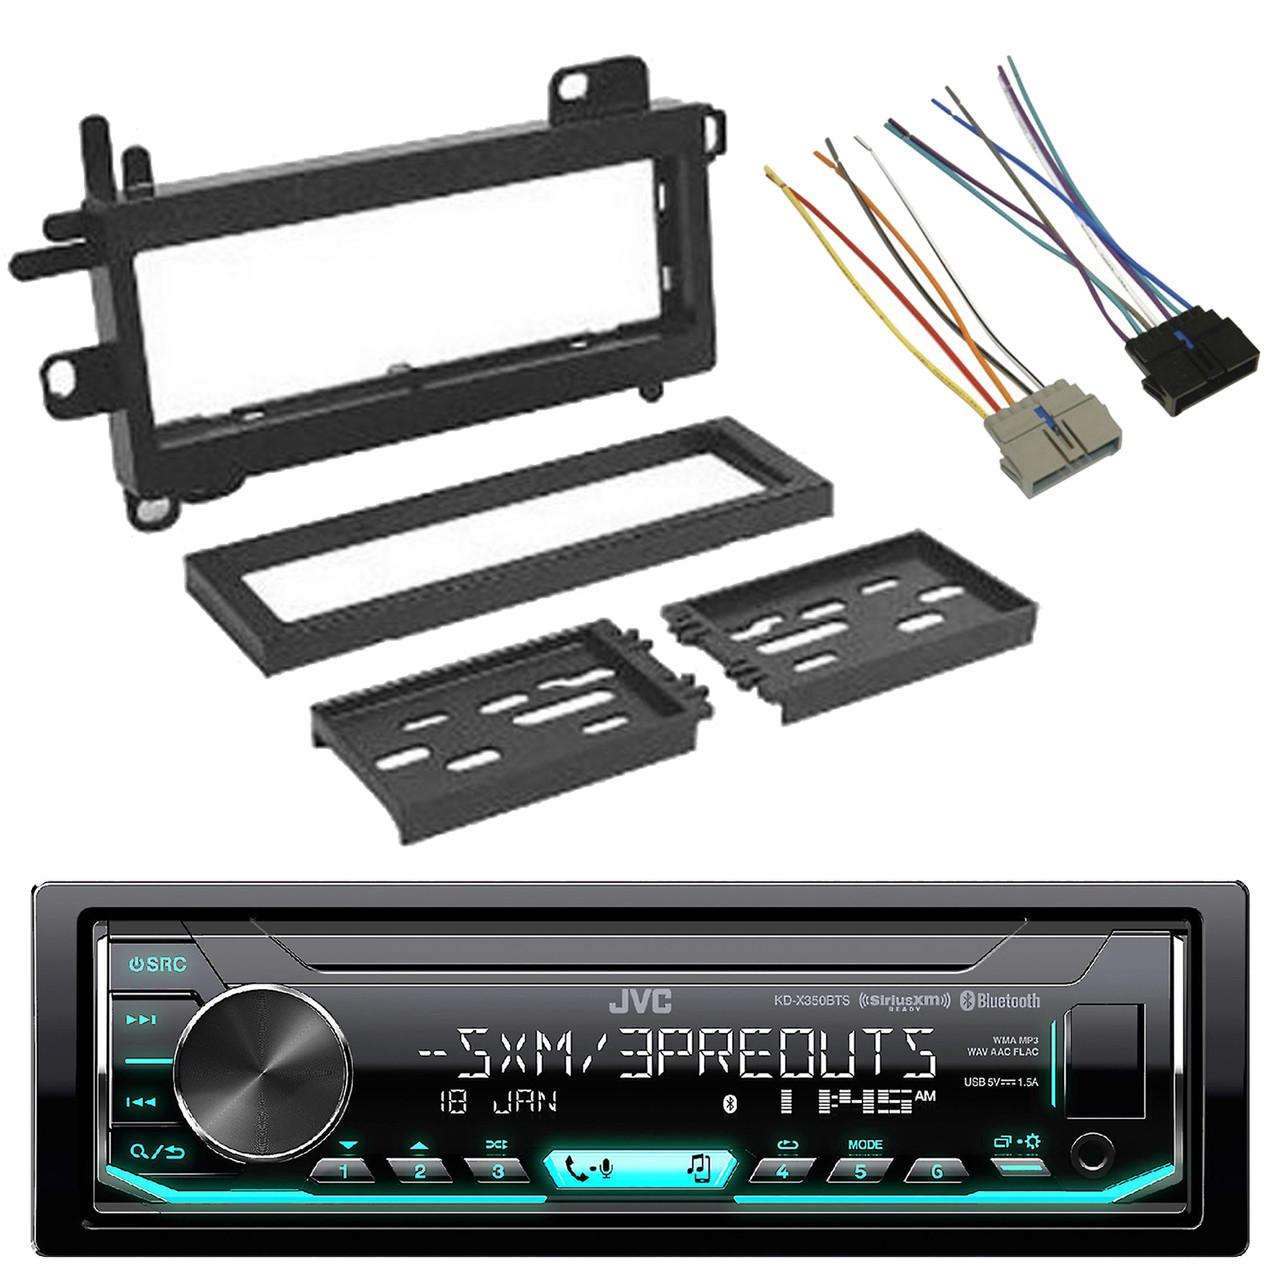 jvc usb aux siriusxm ready bluetooth car radio scosche wire harness scosche wiring harness  [ 1280 x 1280 Pixel ]